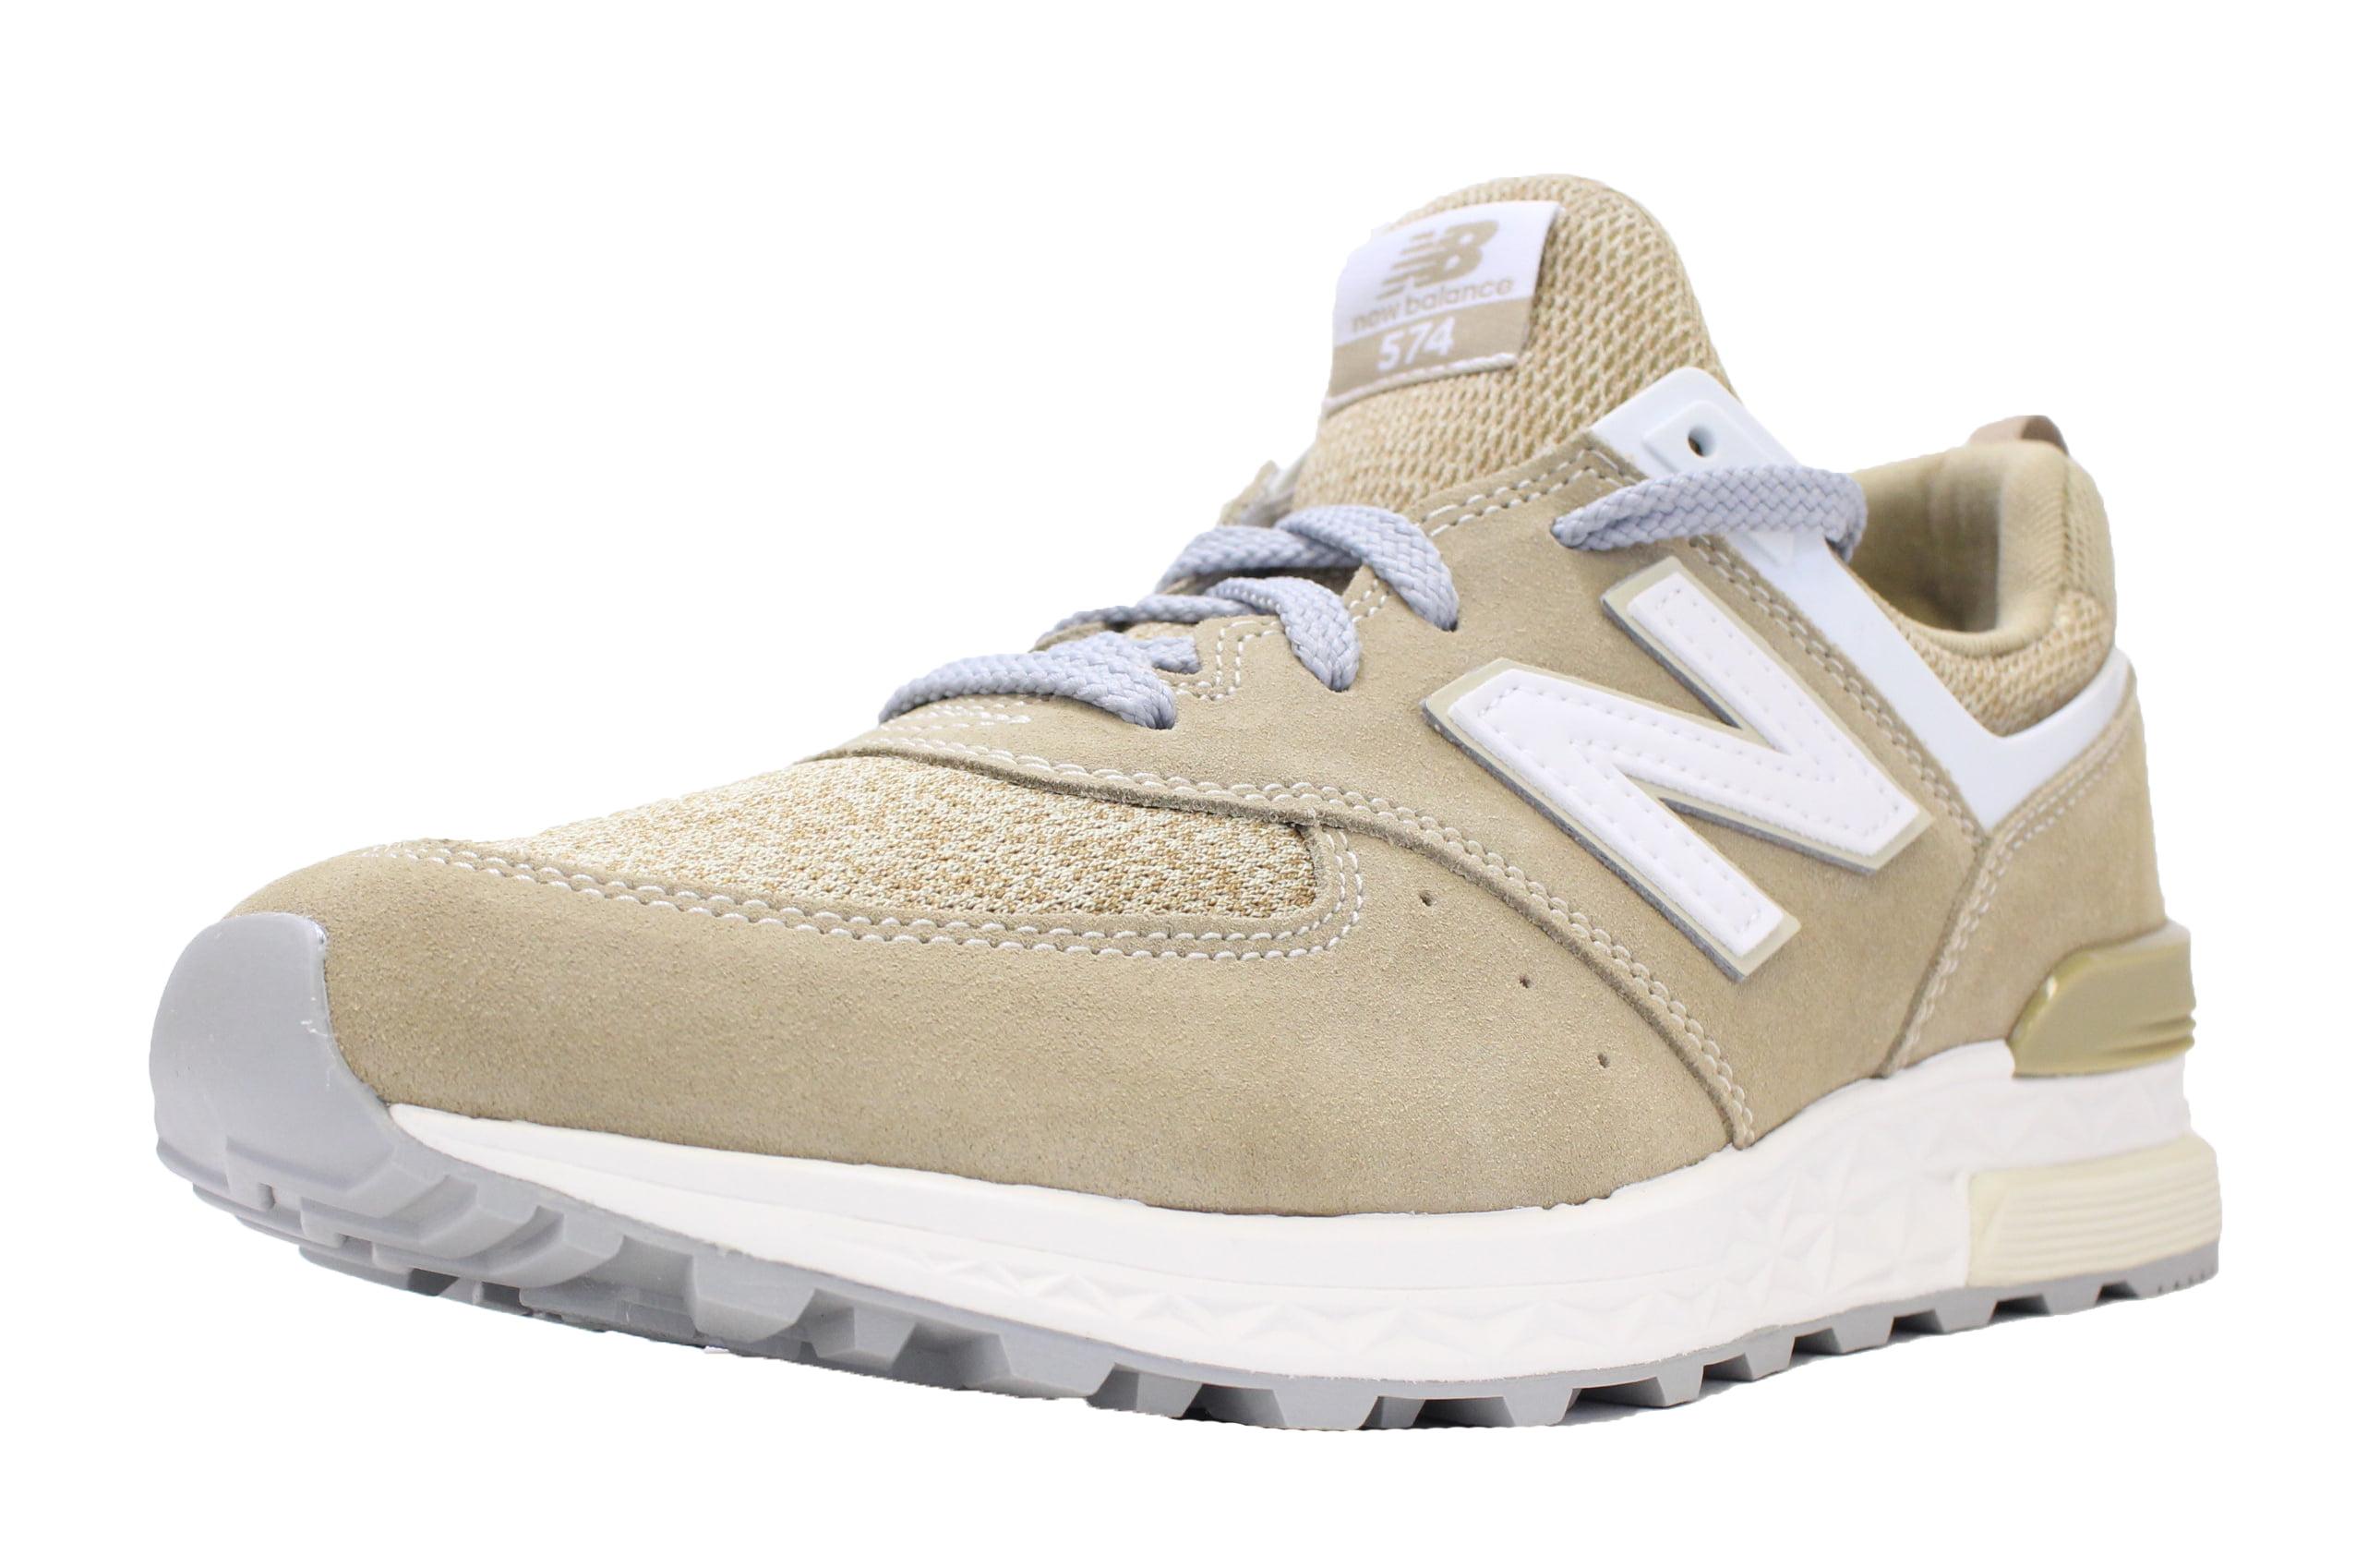 ecbaaf1923286 ... low price new balance 574 sport sz 8 beige white off white tan suede  fresh foam